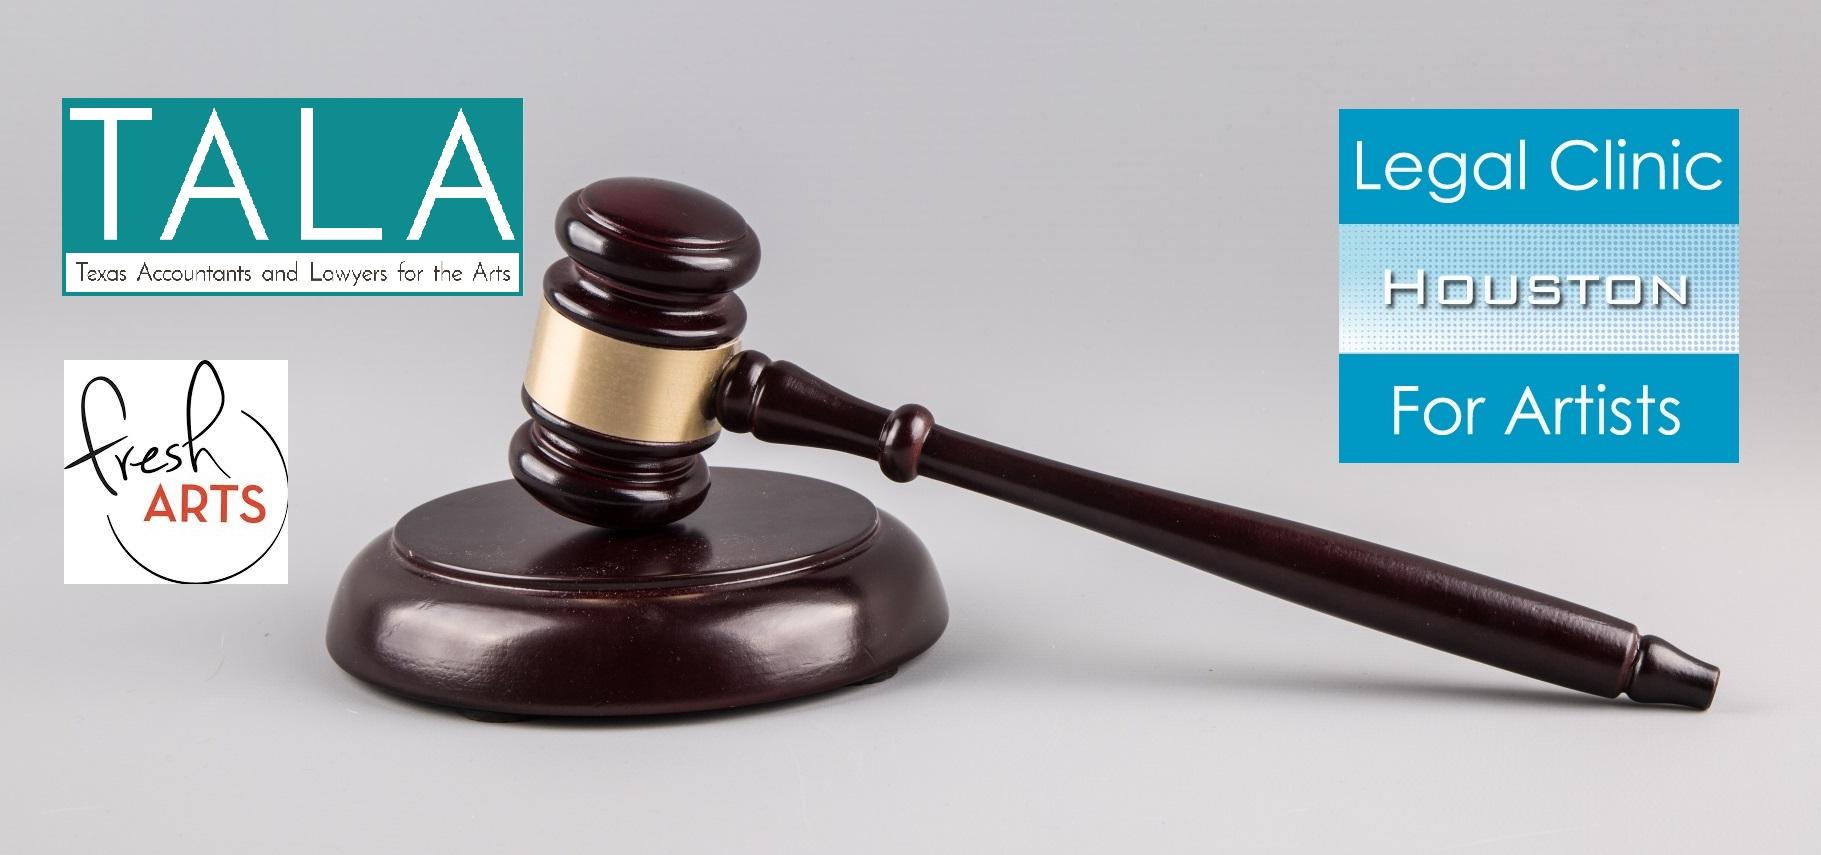 houston legal clinic 2018